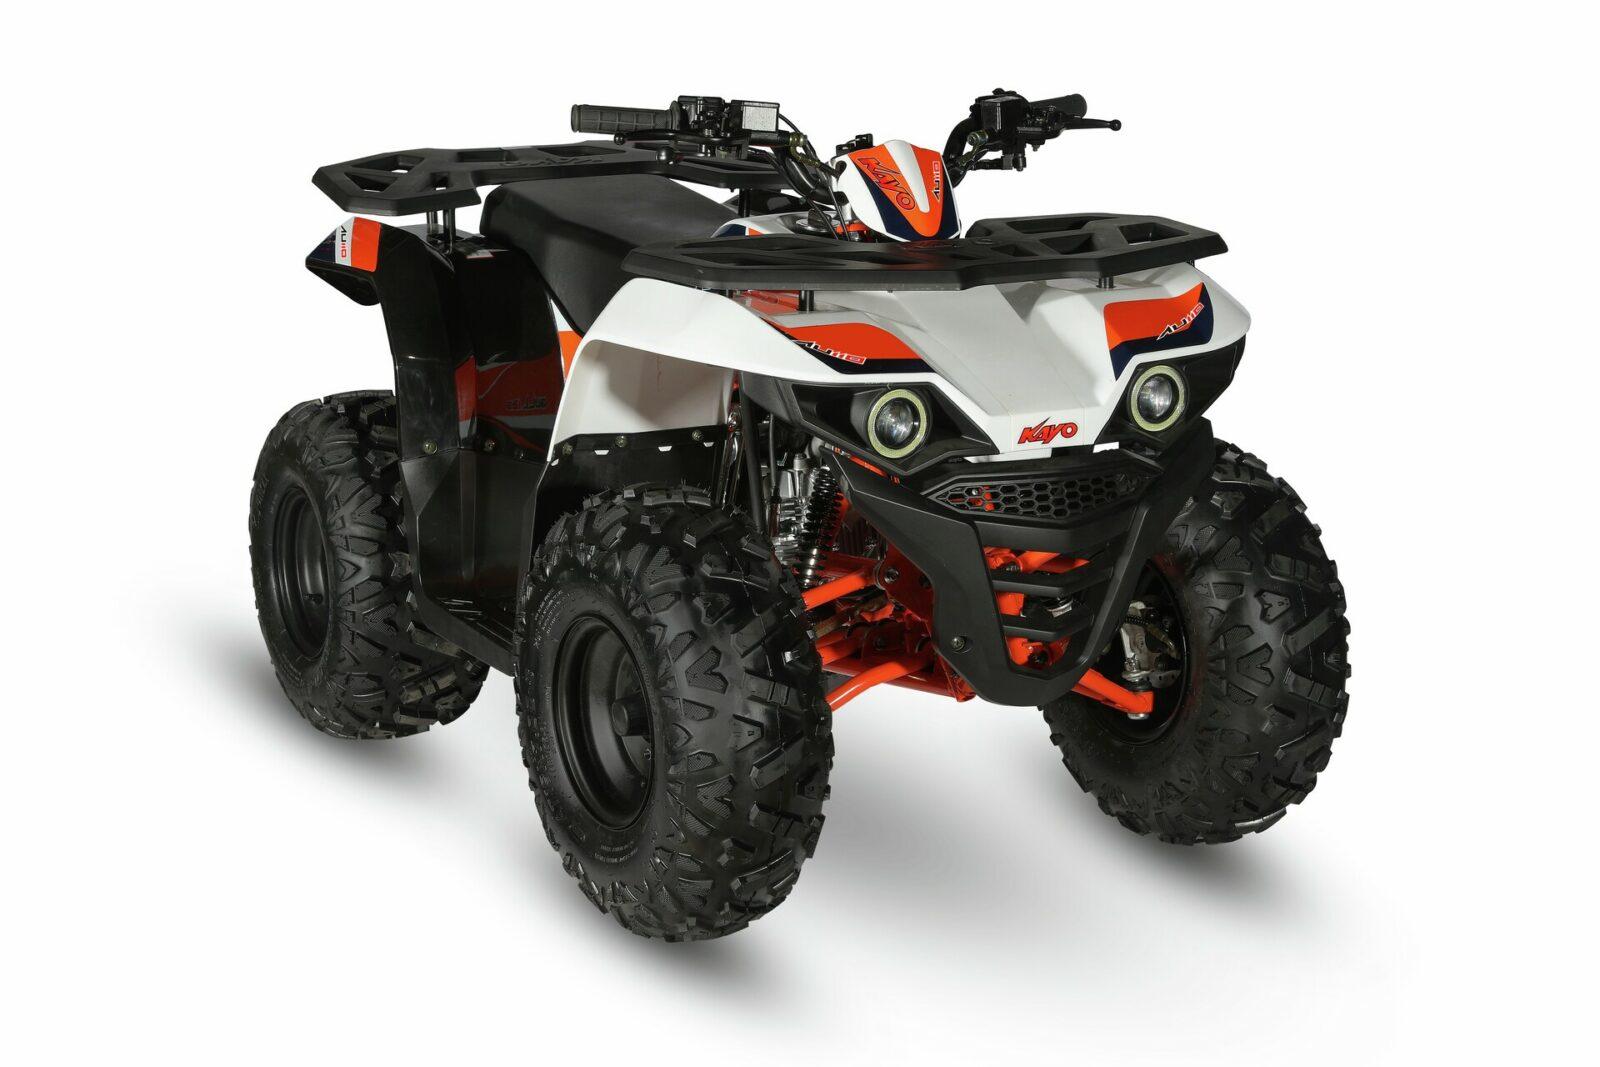 KAYO AU110 ATV 01932 1920